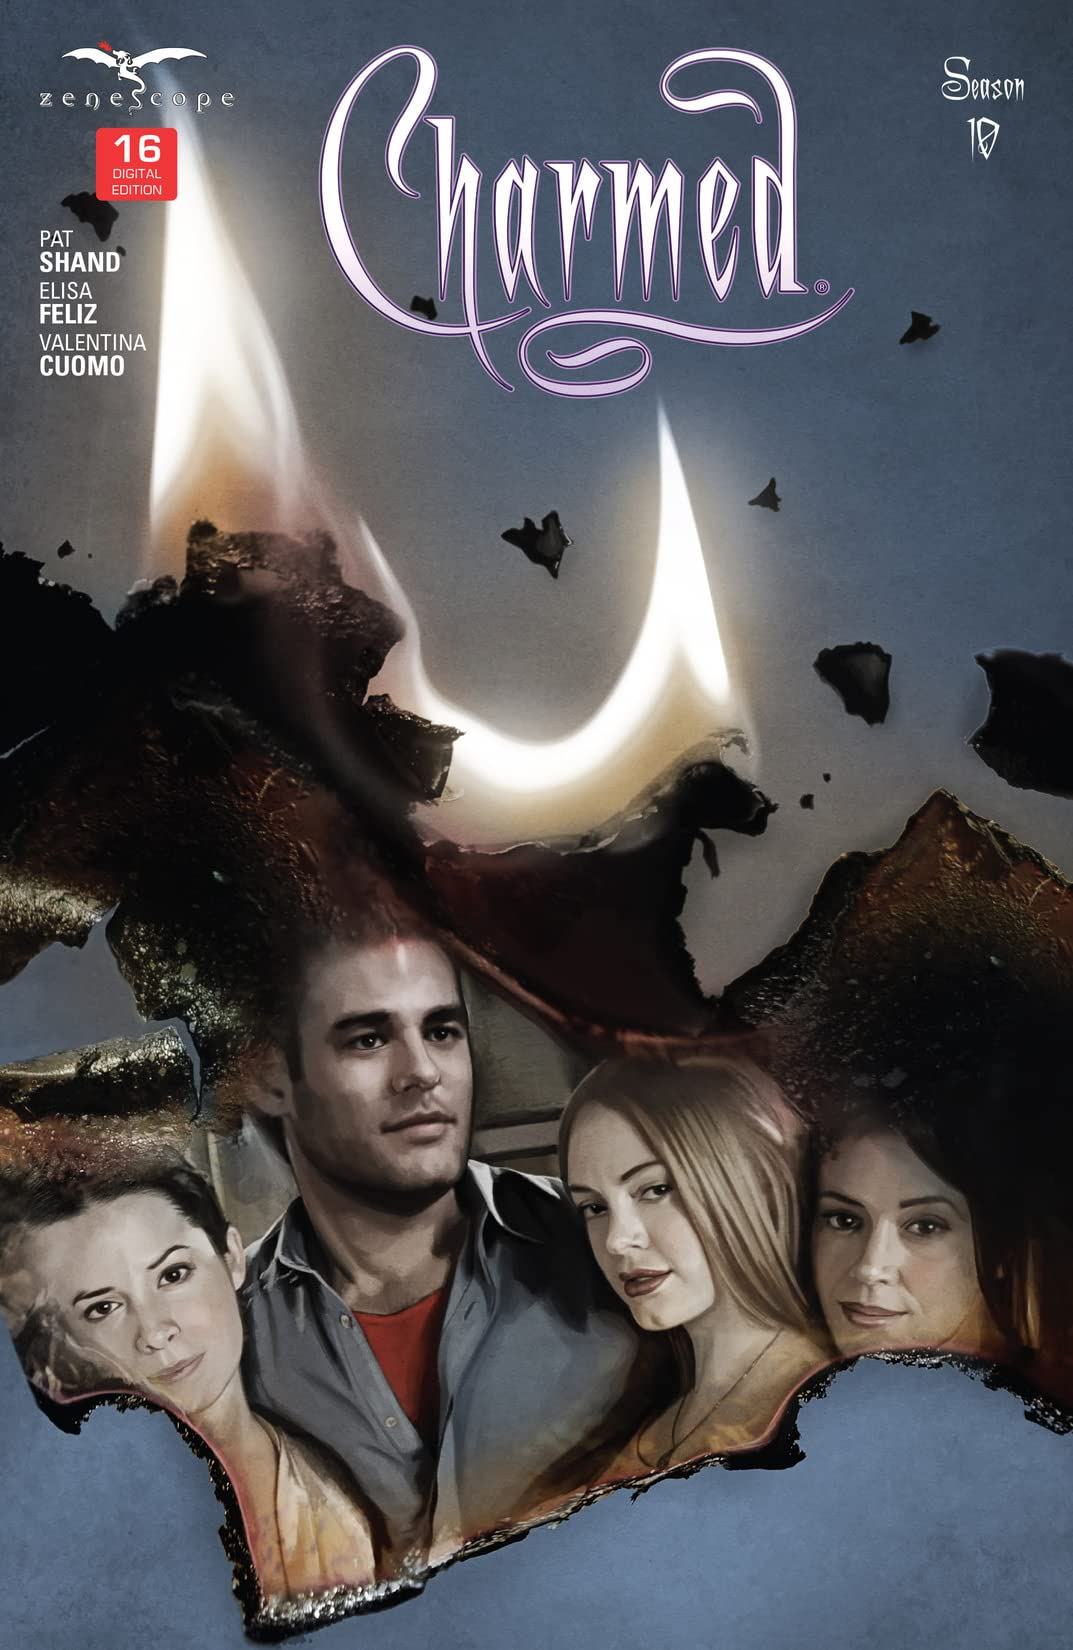 Charmed: Season 10 #16